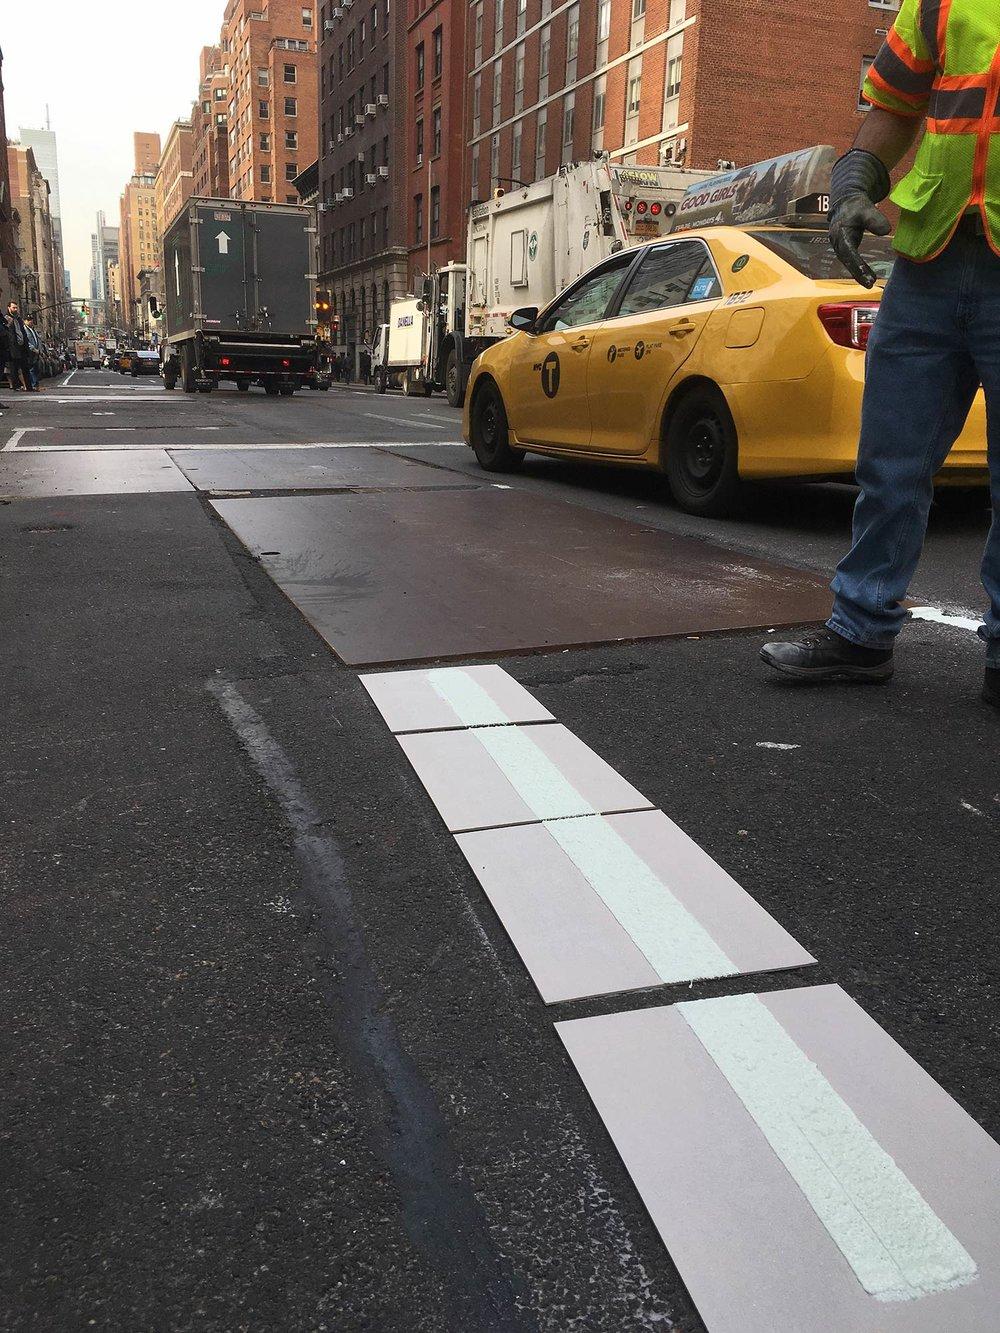 Road Marking Crew  Lexington Ave, Btw E77 St - E78 St, Manhattan, New York